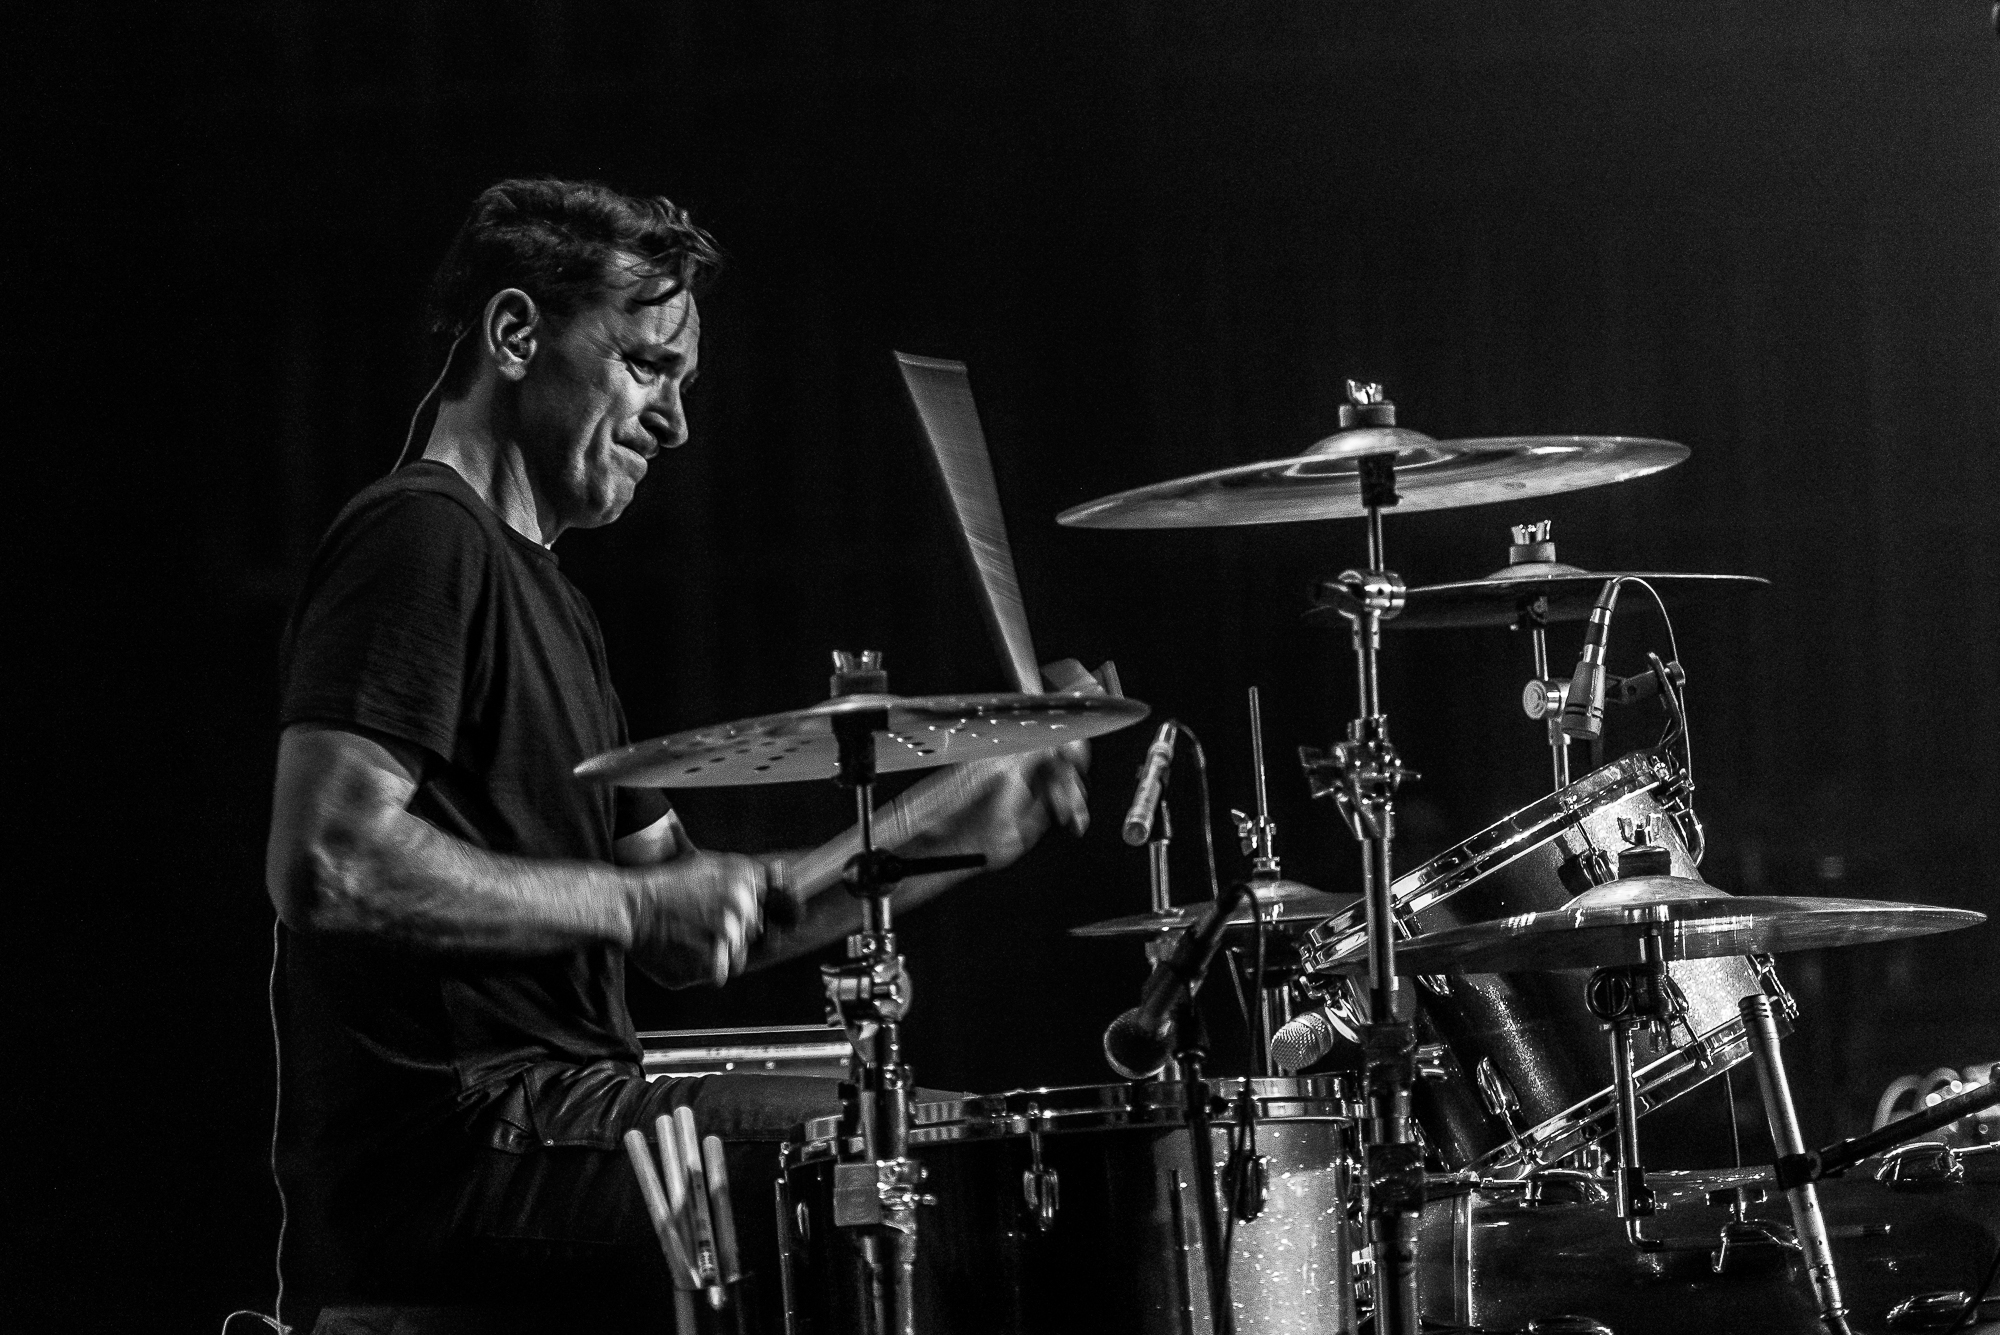 Scott Schwebel - The Gufs